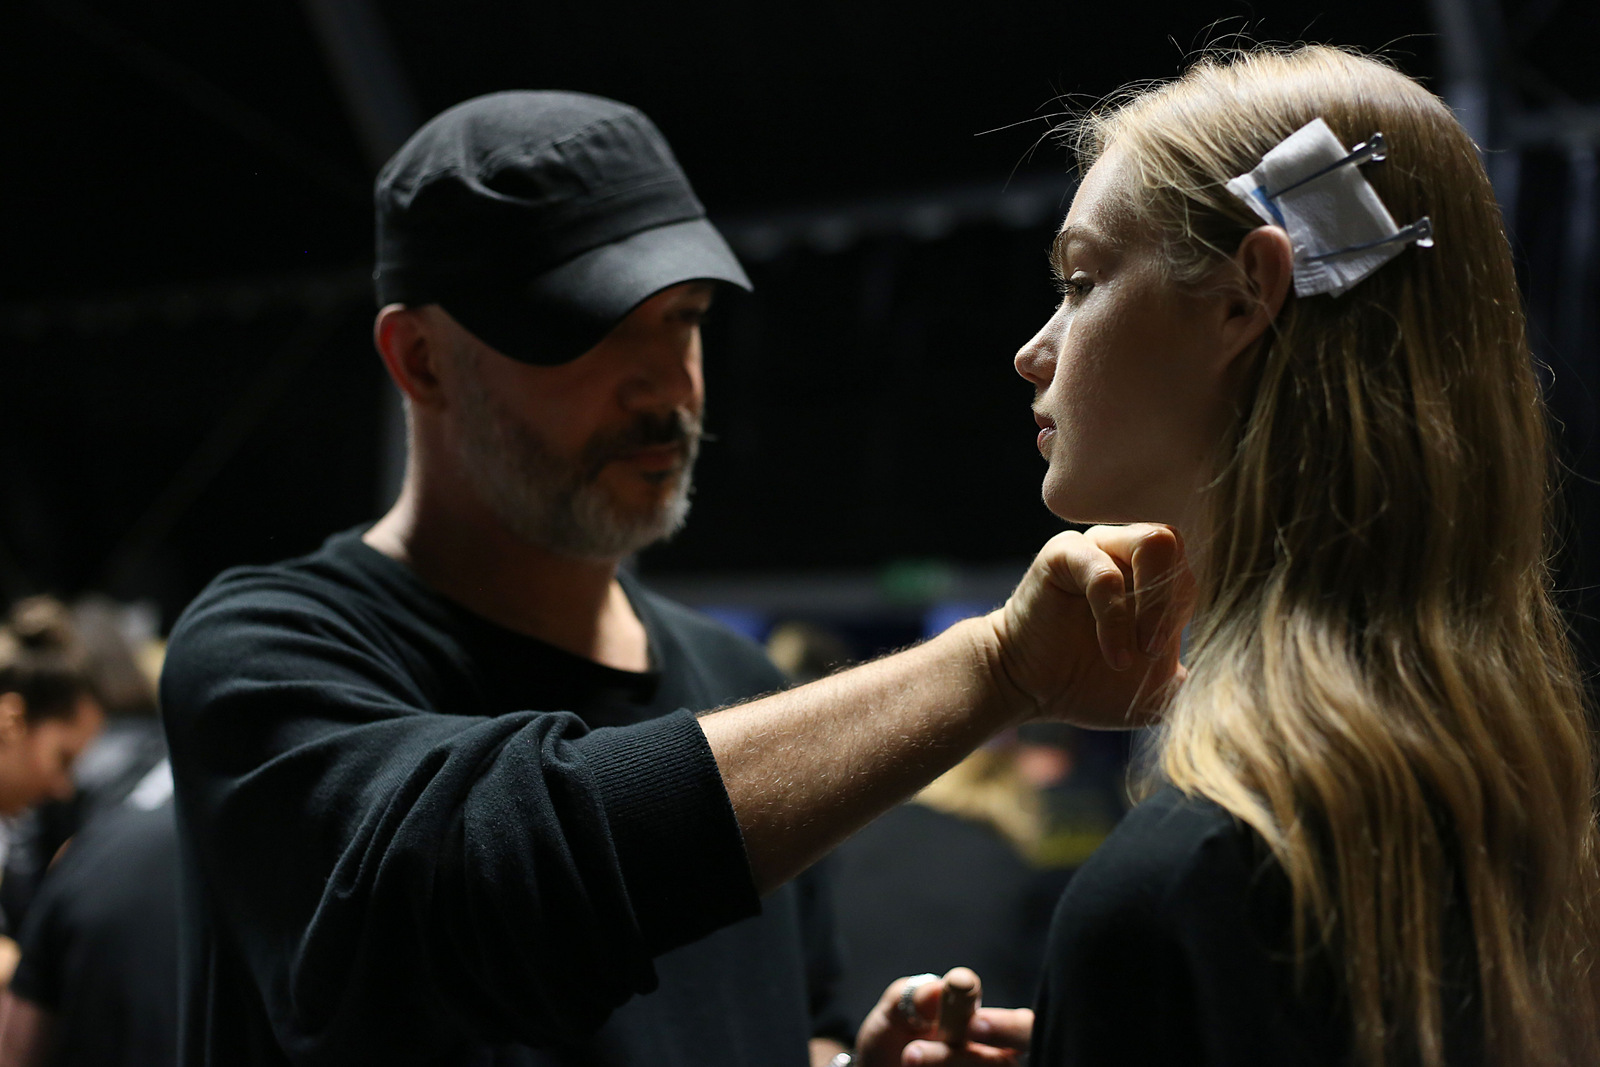 Francesco Scognamiglio Backstage with Clinique